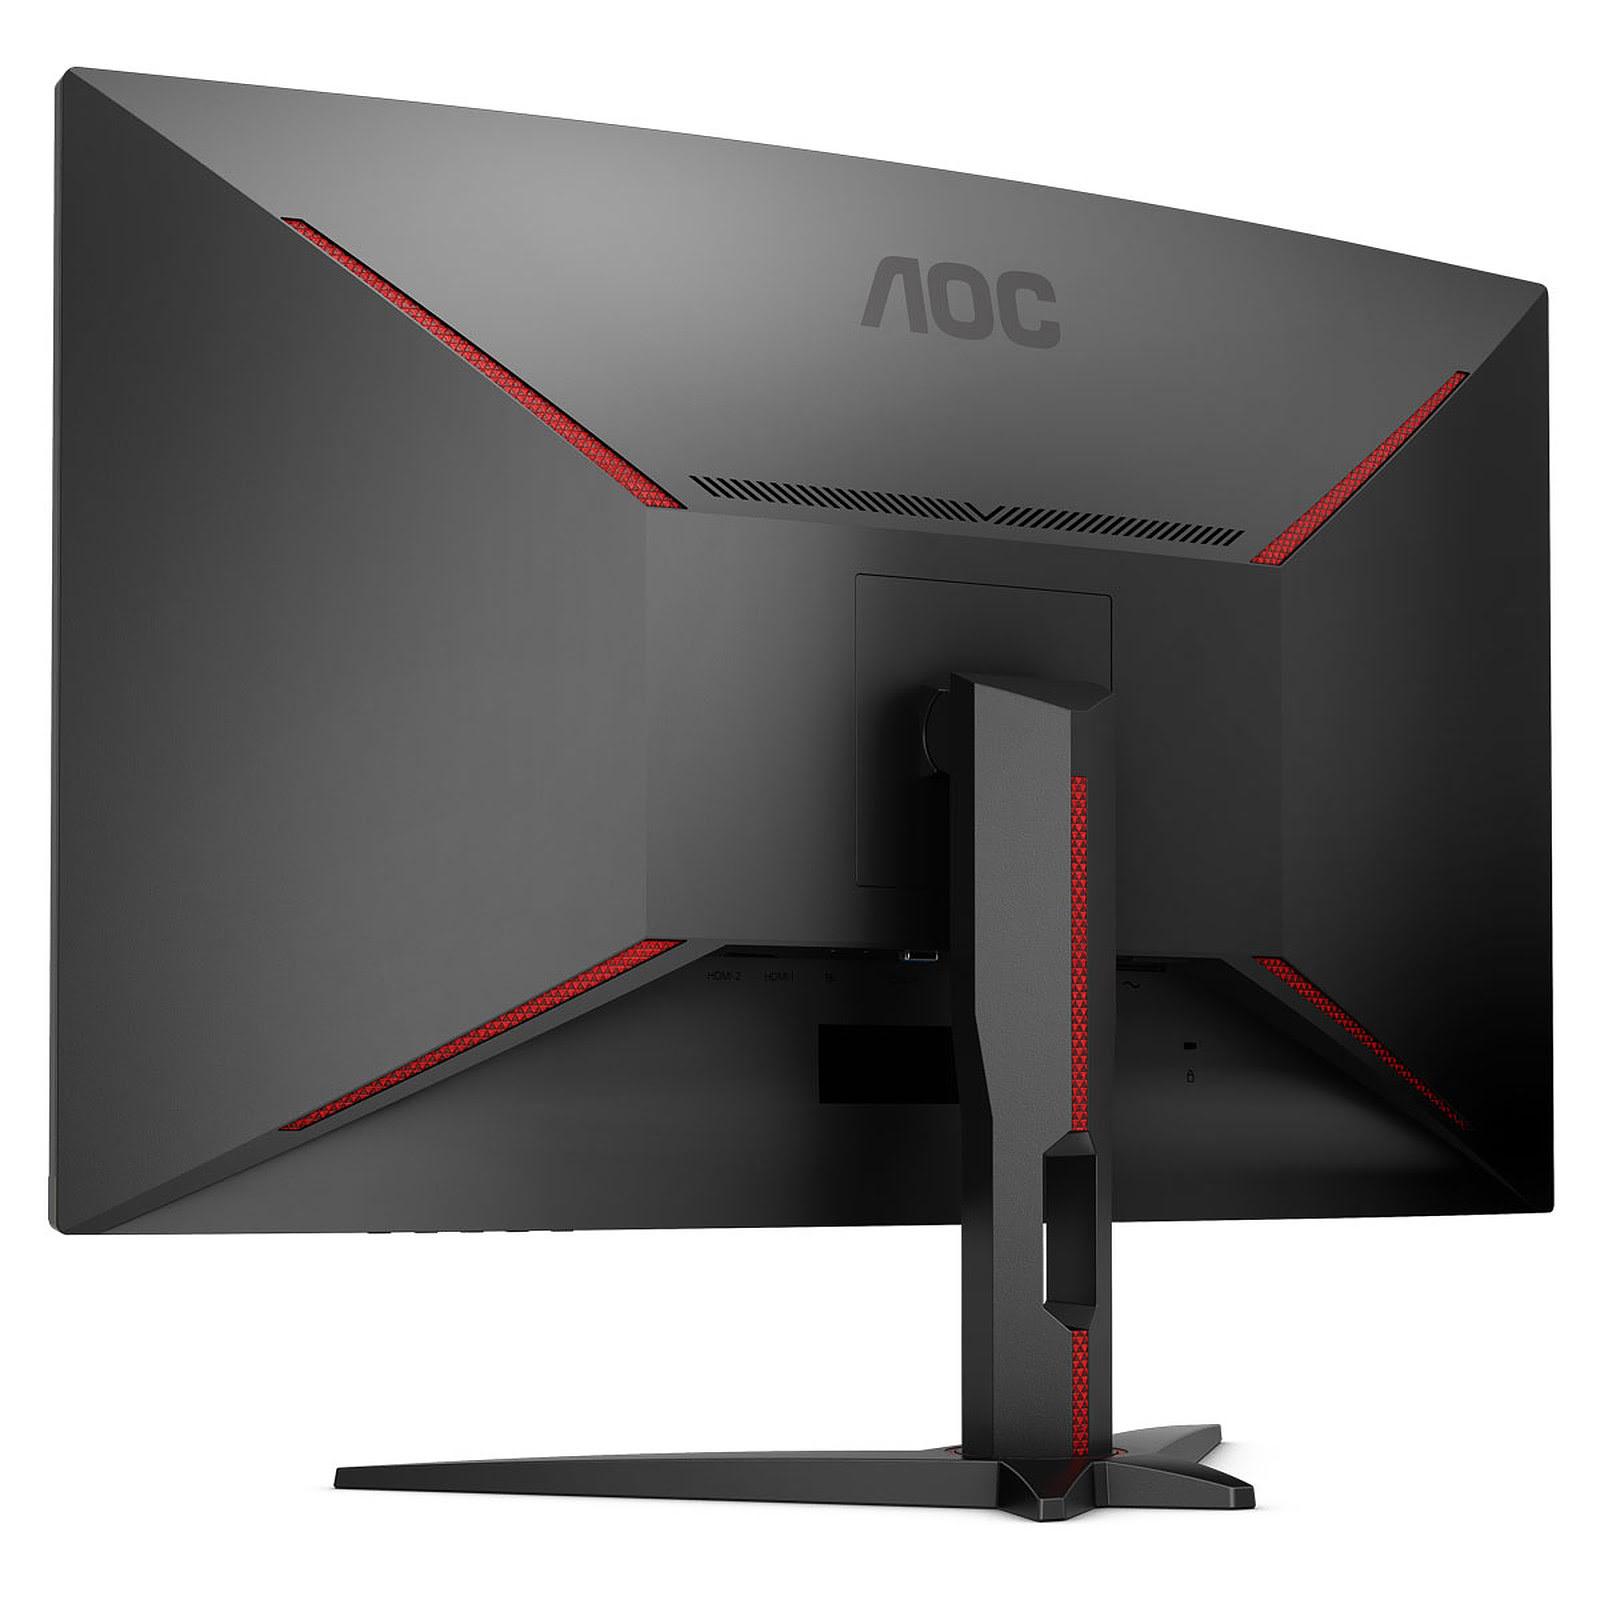 "C32G1 - 31.5"" VA incurvé/1ms/WQHD/FS/DP/HDMI/144Hz (C32G1) - Achat / Vente Ecran PC sur Picata.fr - 1"